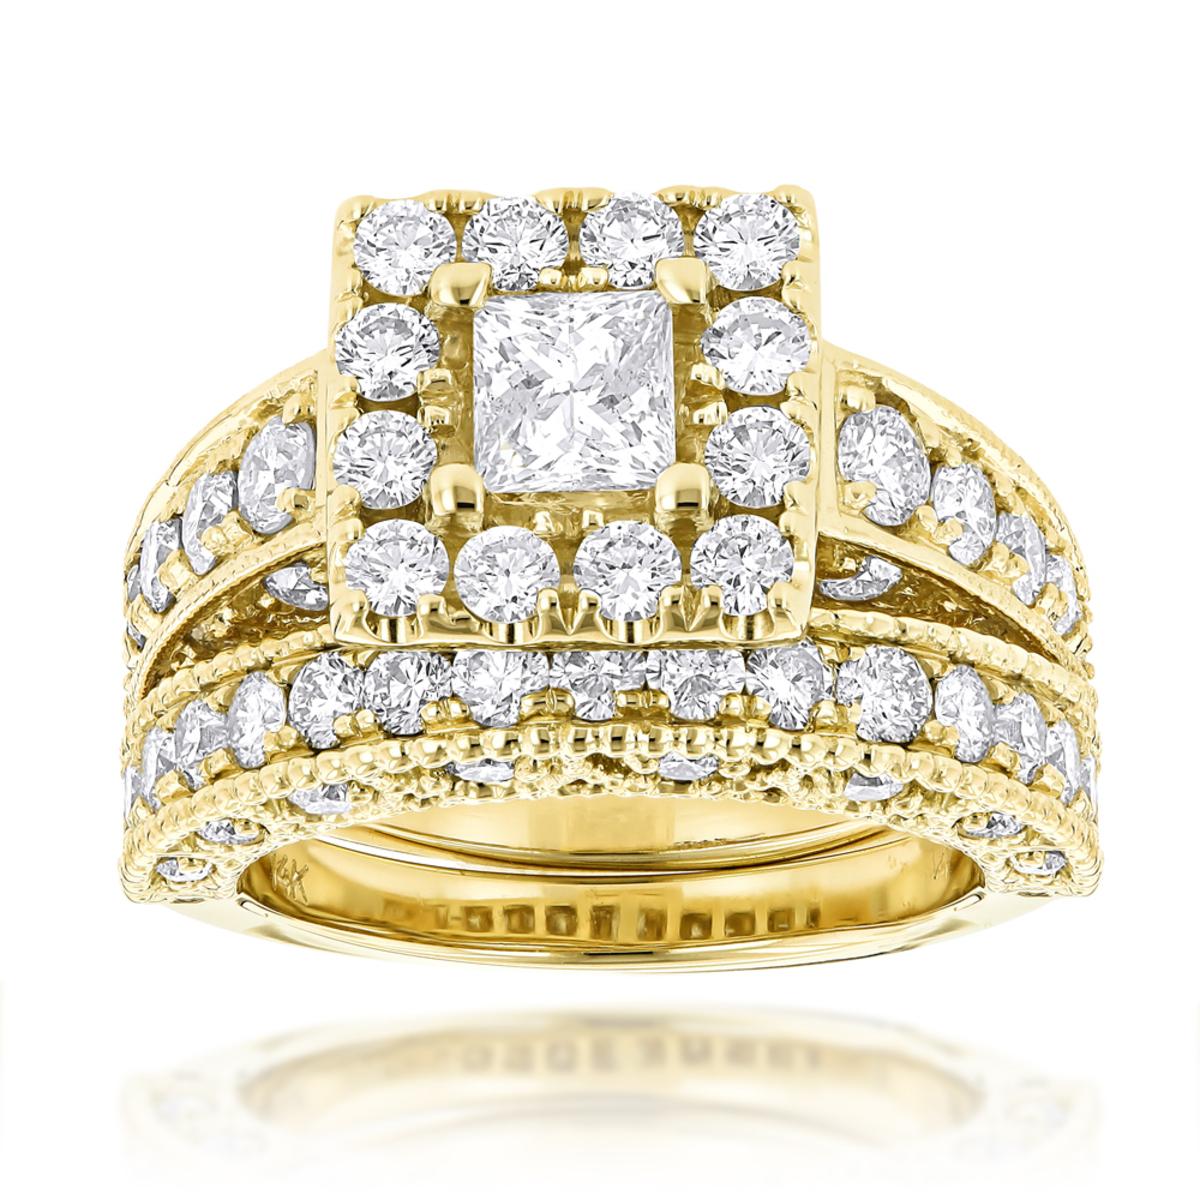 Princess Cut Round Diamond Engagement Ring Wedding Band Set 3.5ct 14K Gold